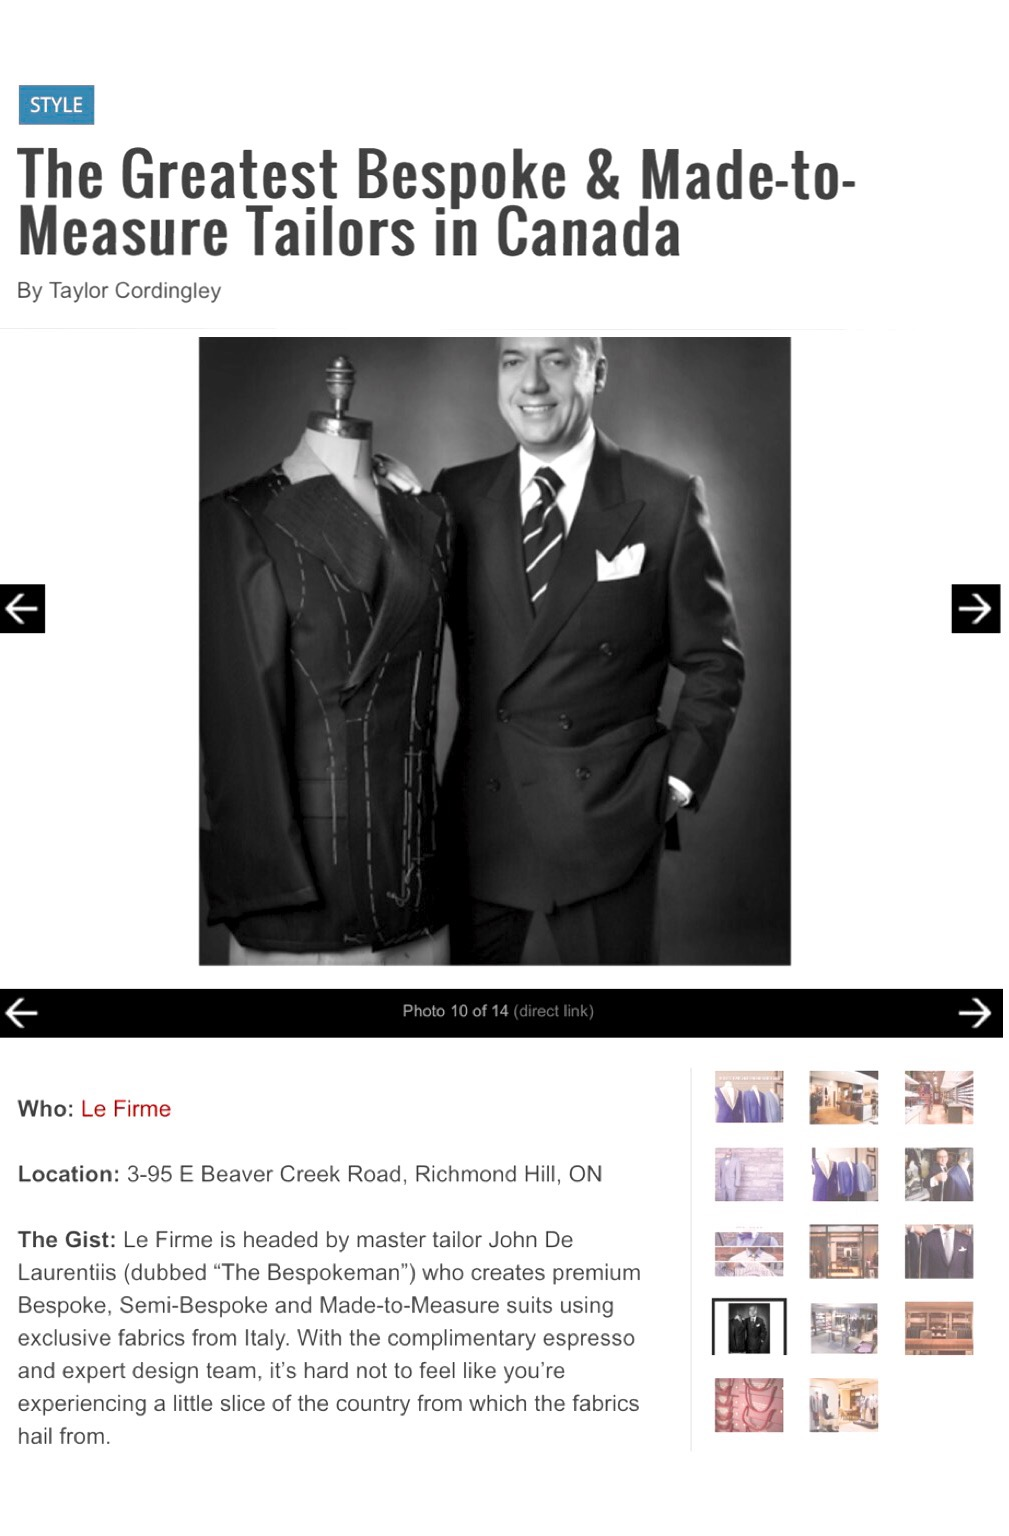 Bespoke Suits Custom Suits Bespoke Tailor Toronto GTA About The Bespokeman